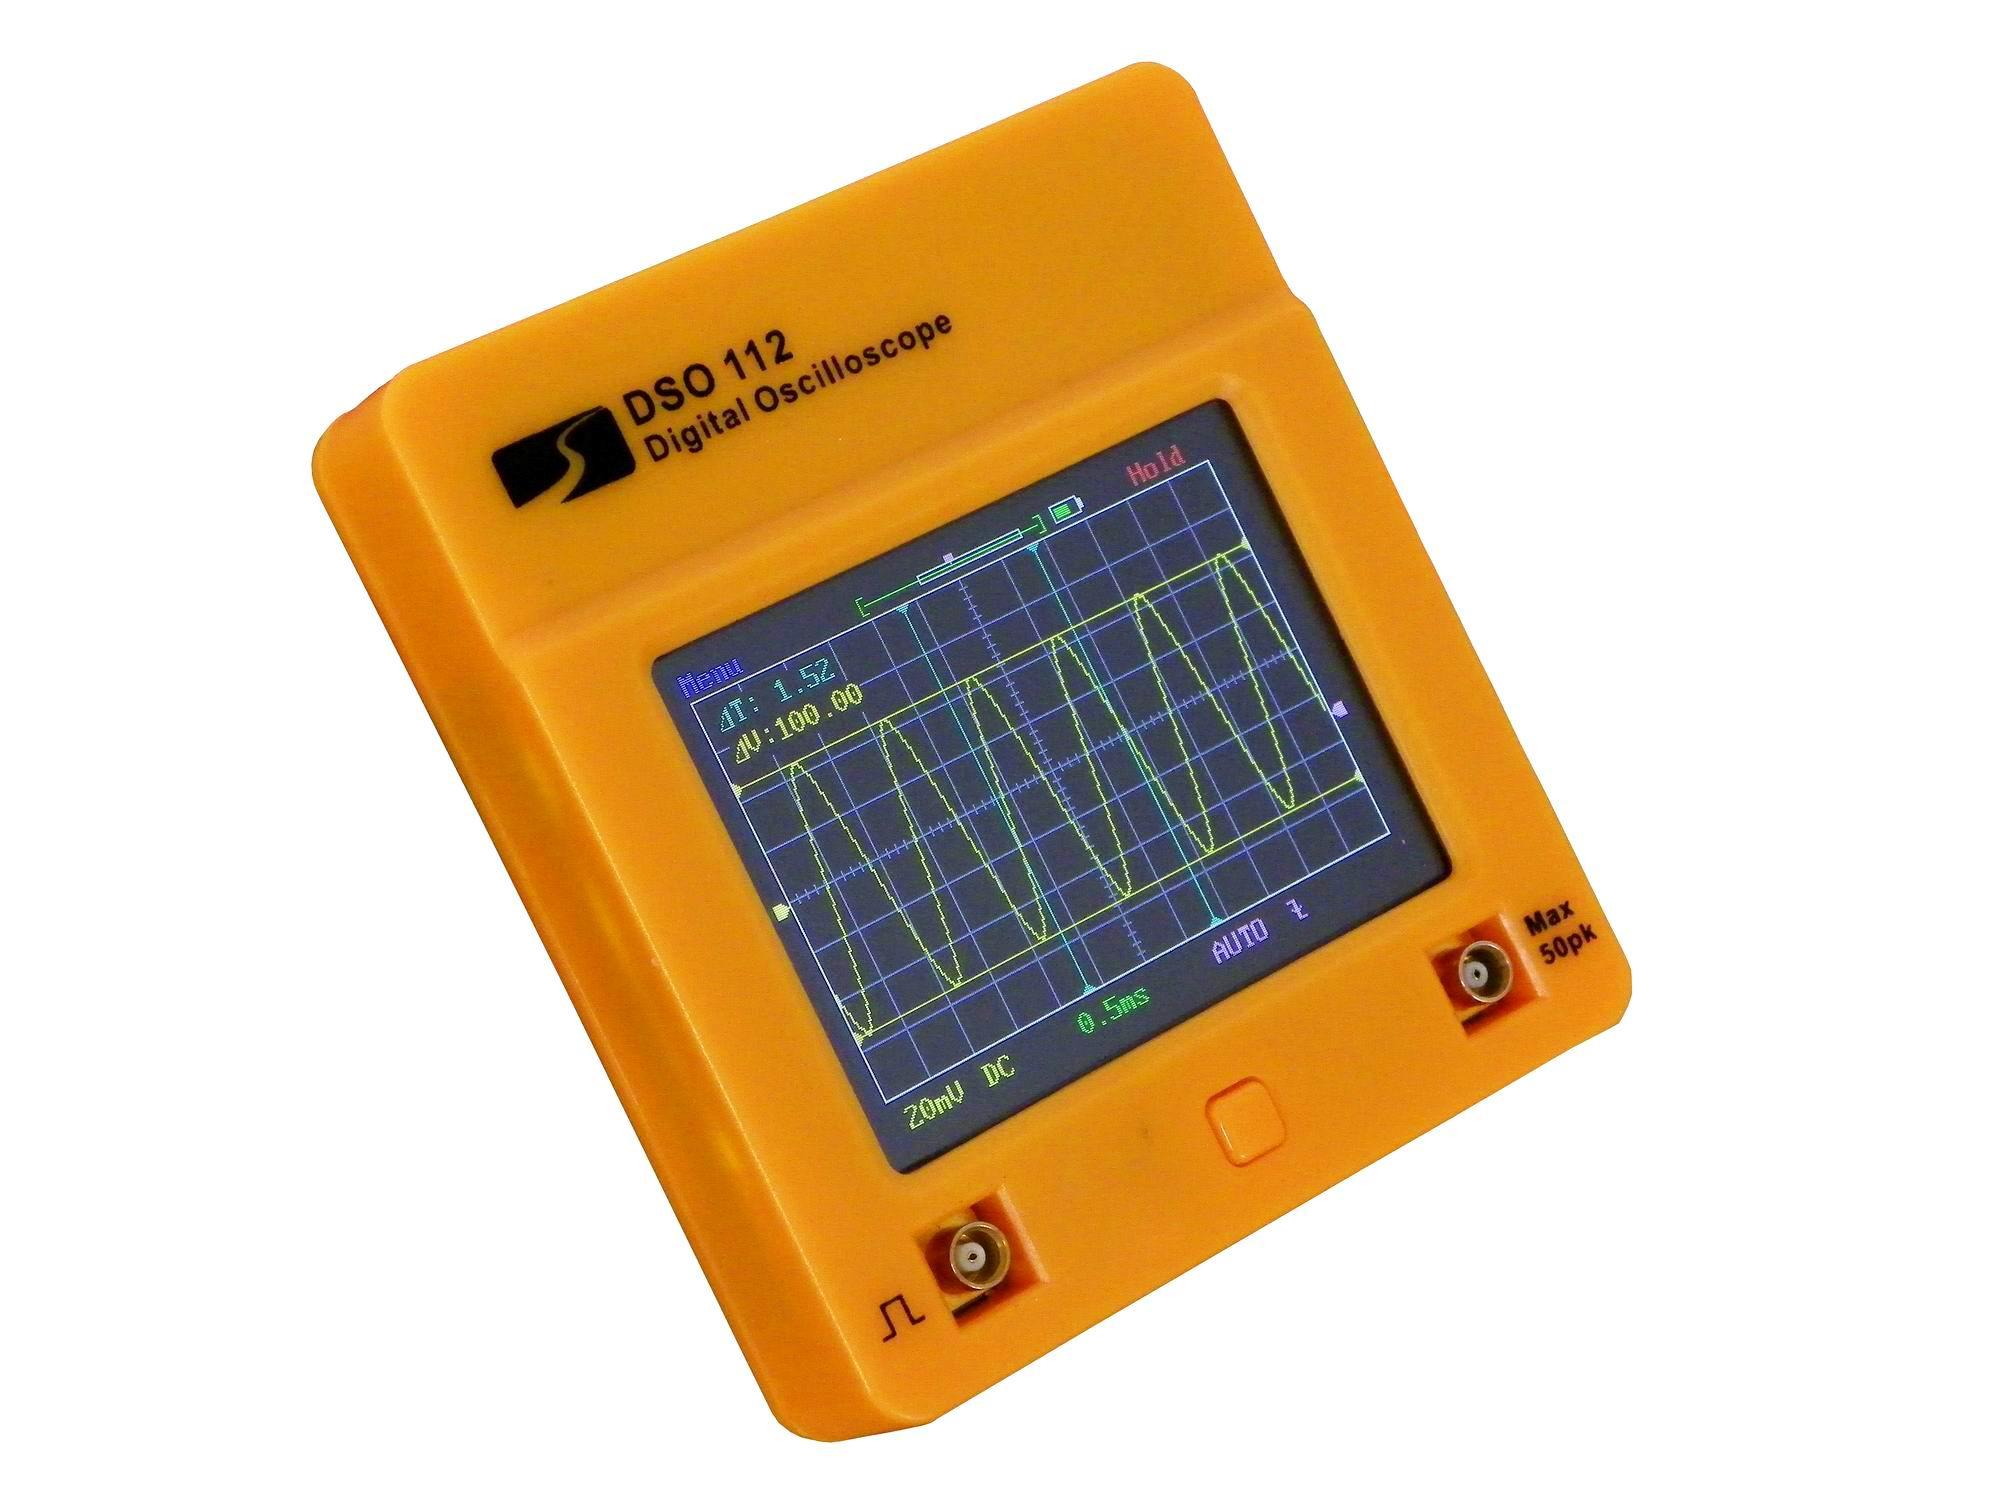 JYE Tech: DIY Oscilloscopes, DIY Kits for Hobbyists